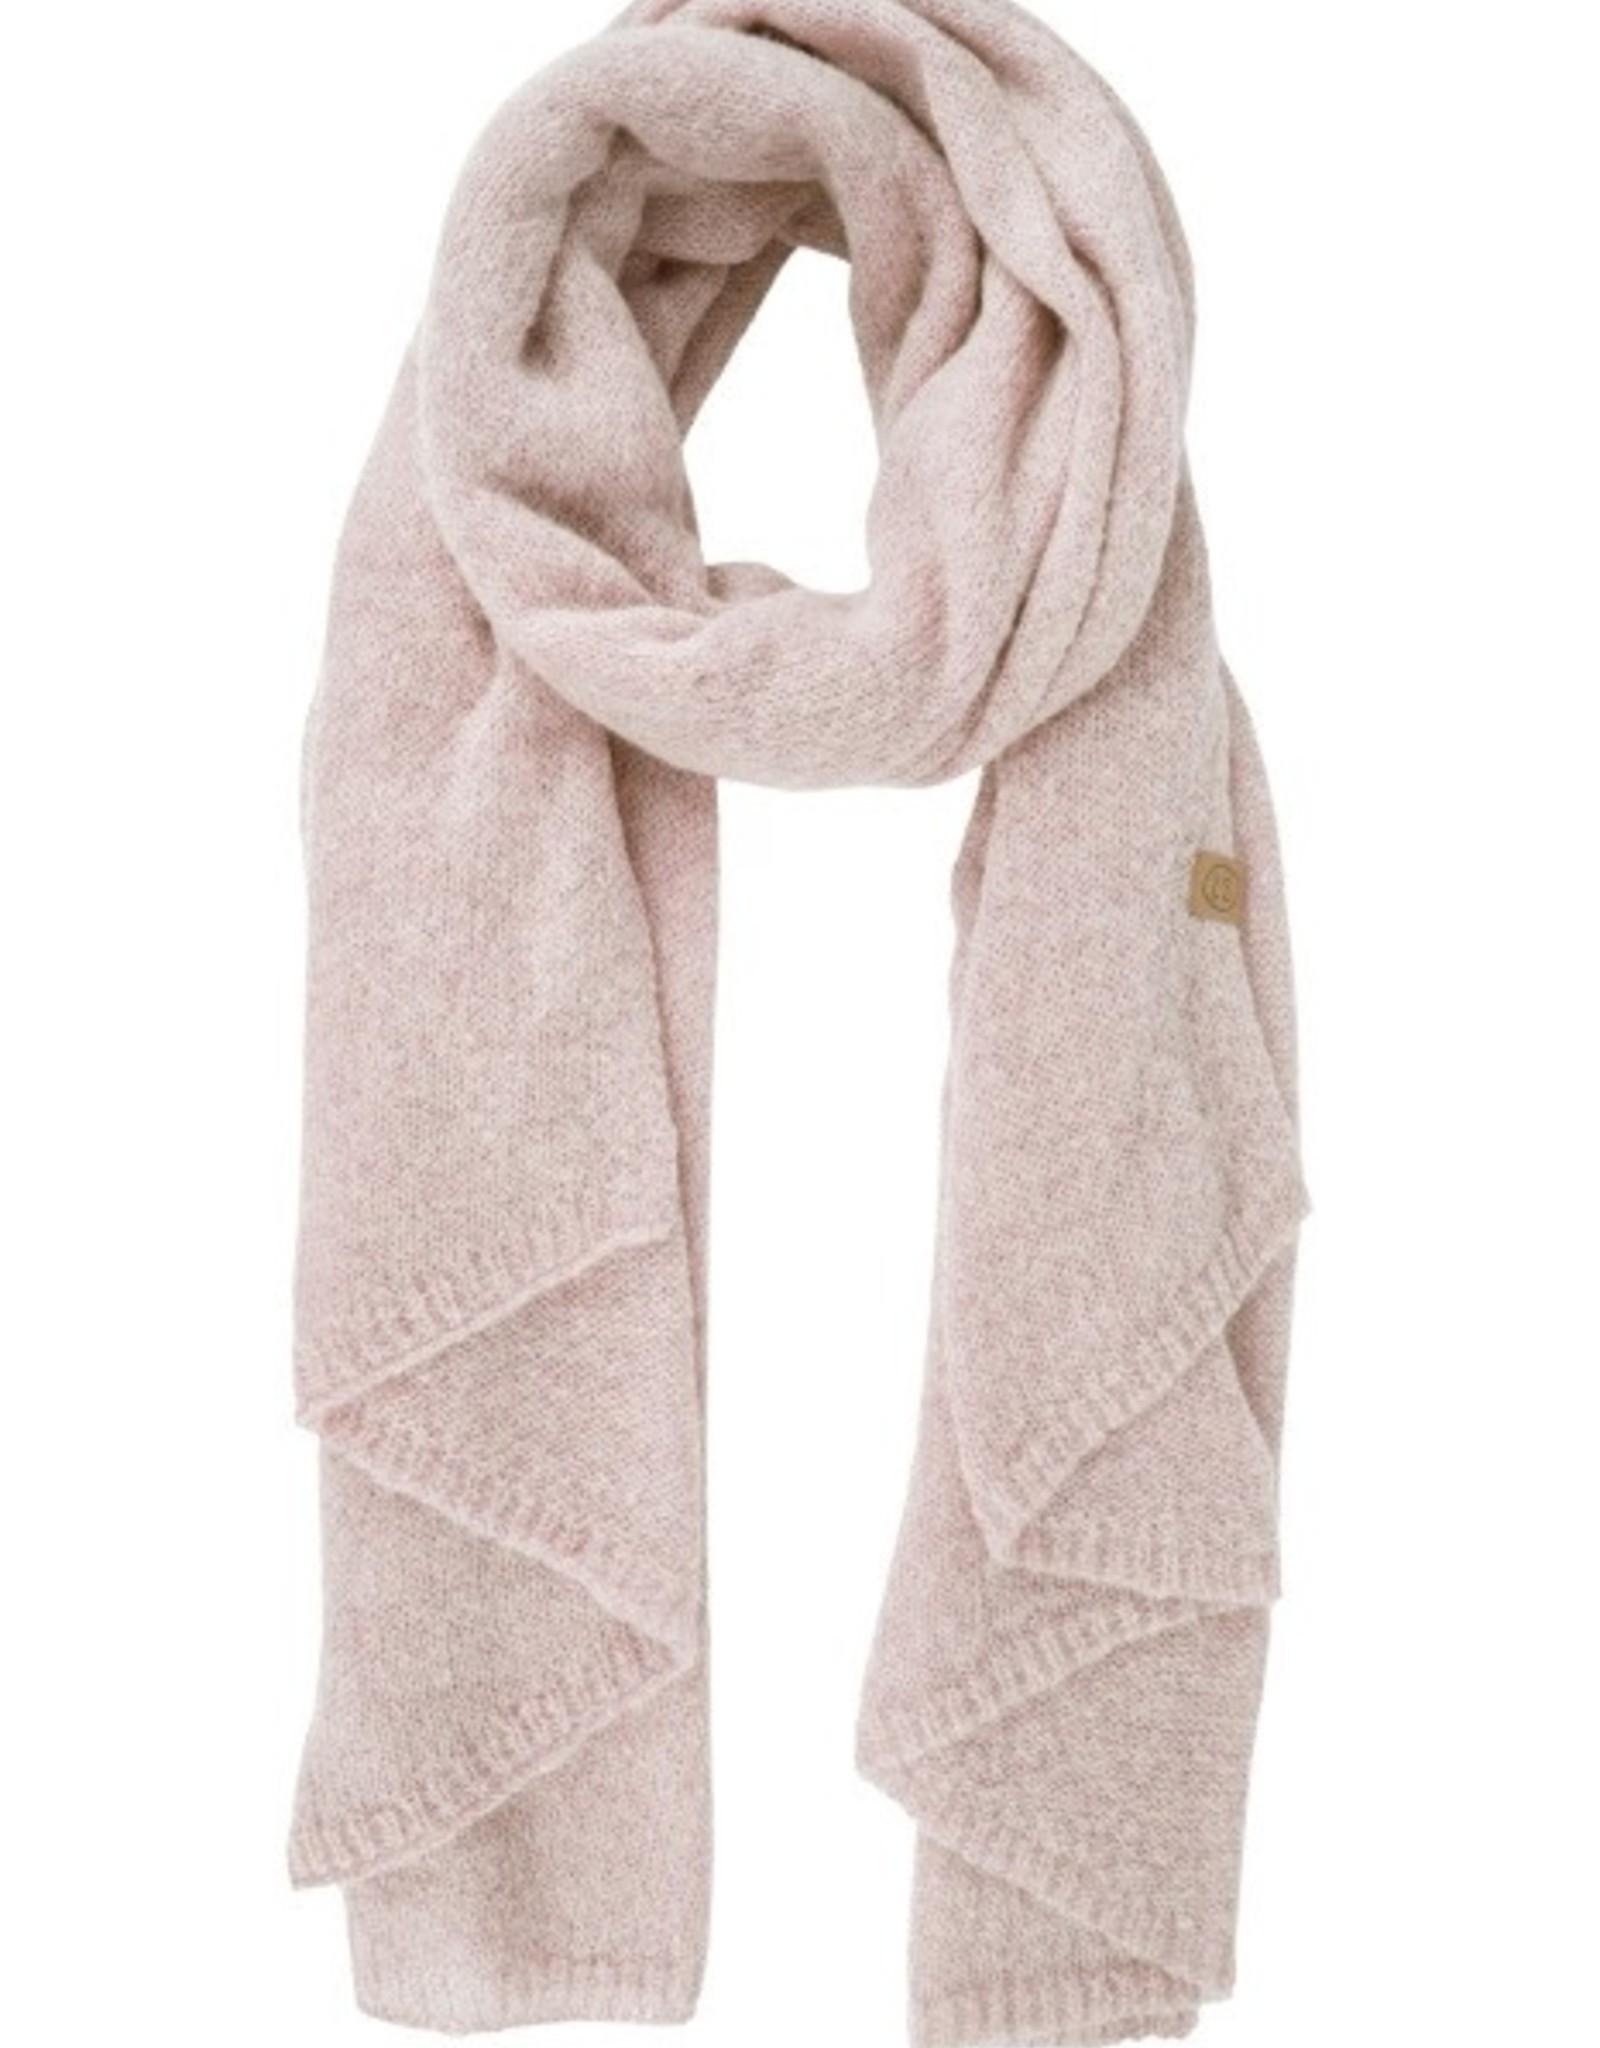 Zusss Zusss - Warme brei sjaal - Poederroze